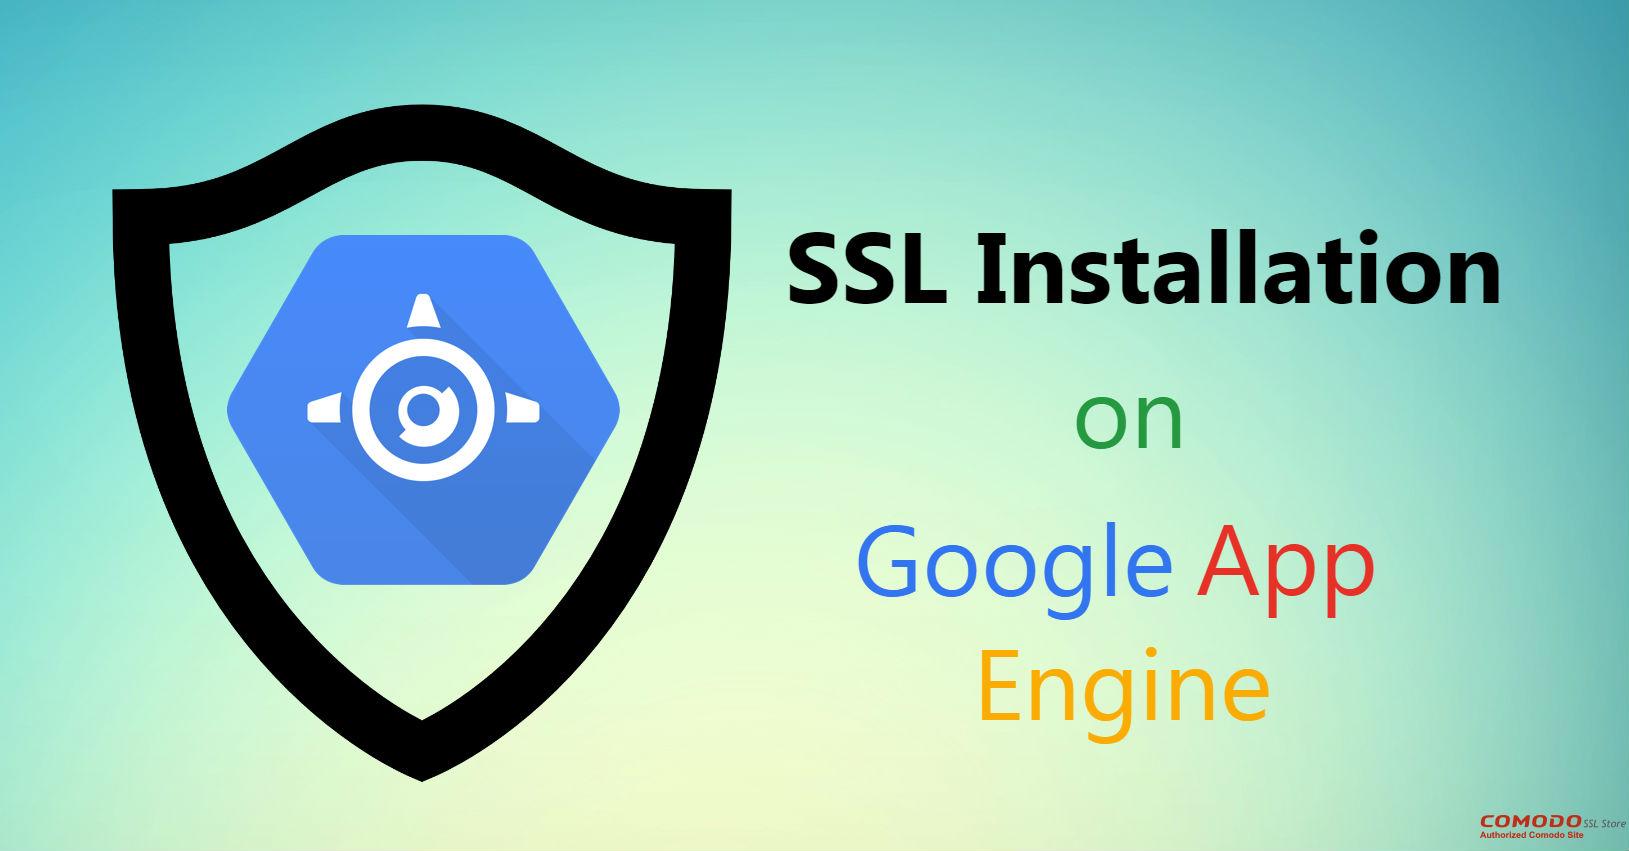 Build A Website On Google App Engine